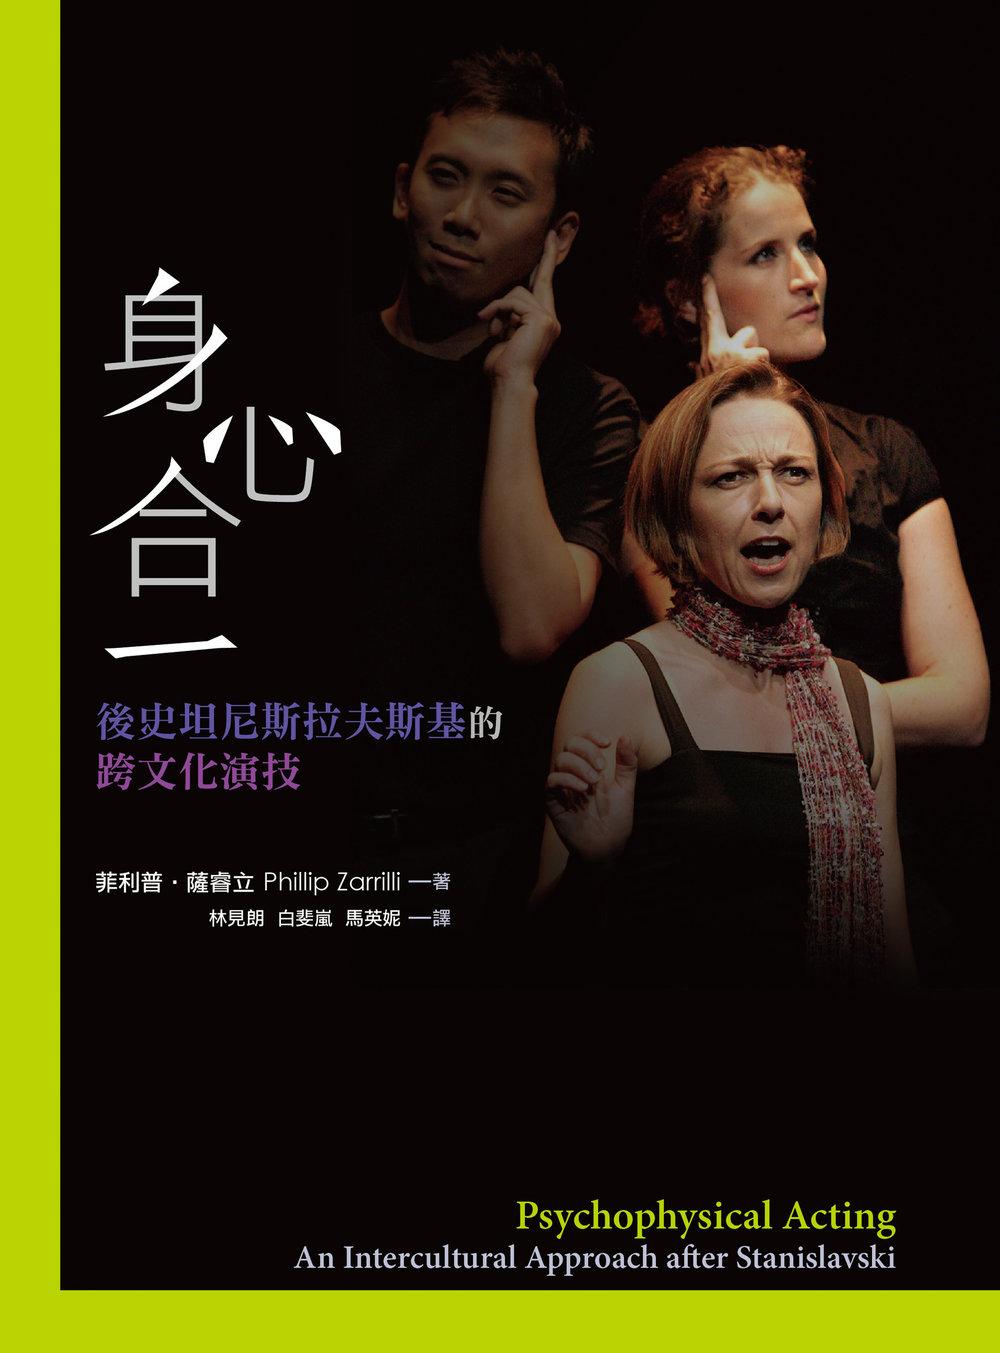 Mandarin translation published by Bookman Press, Taipei, 2014.